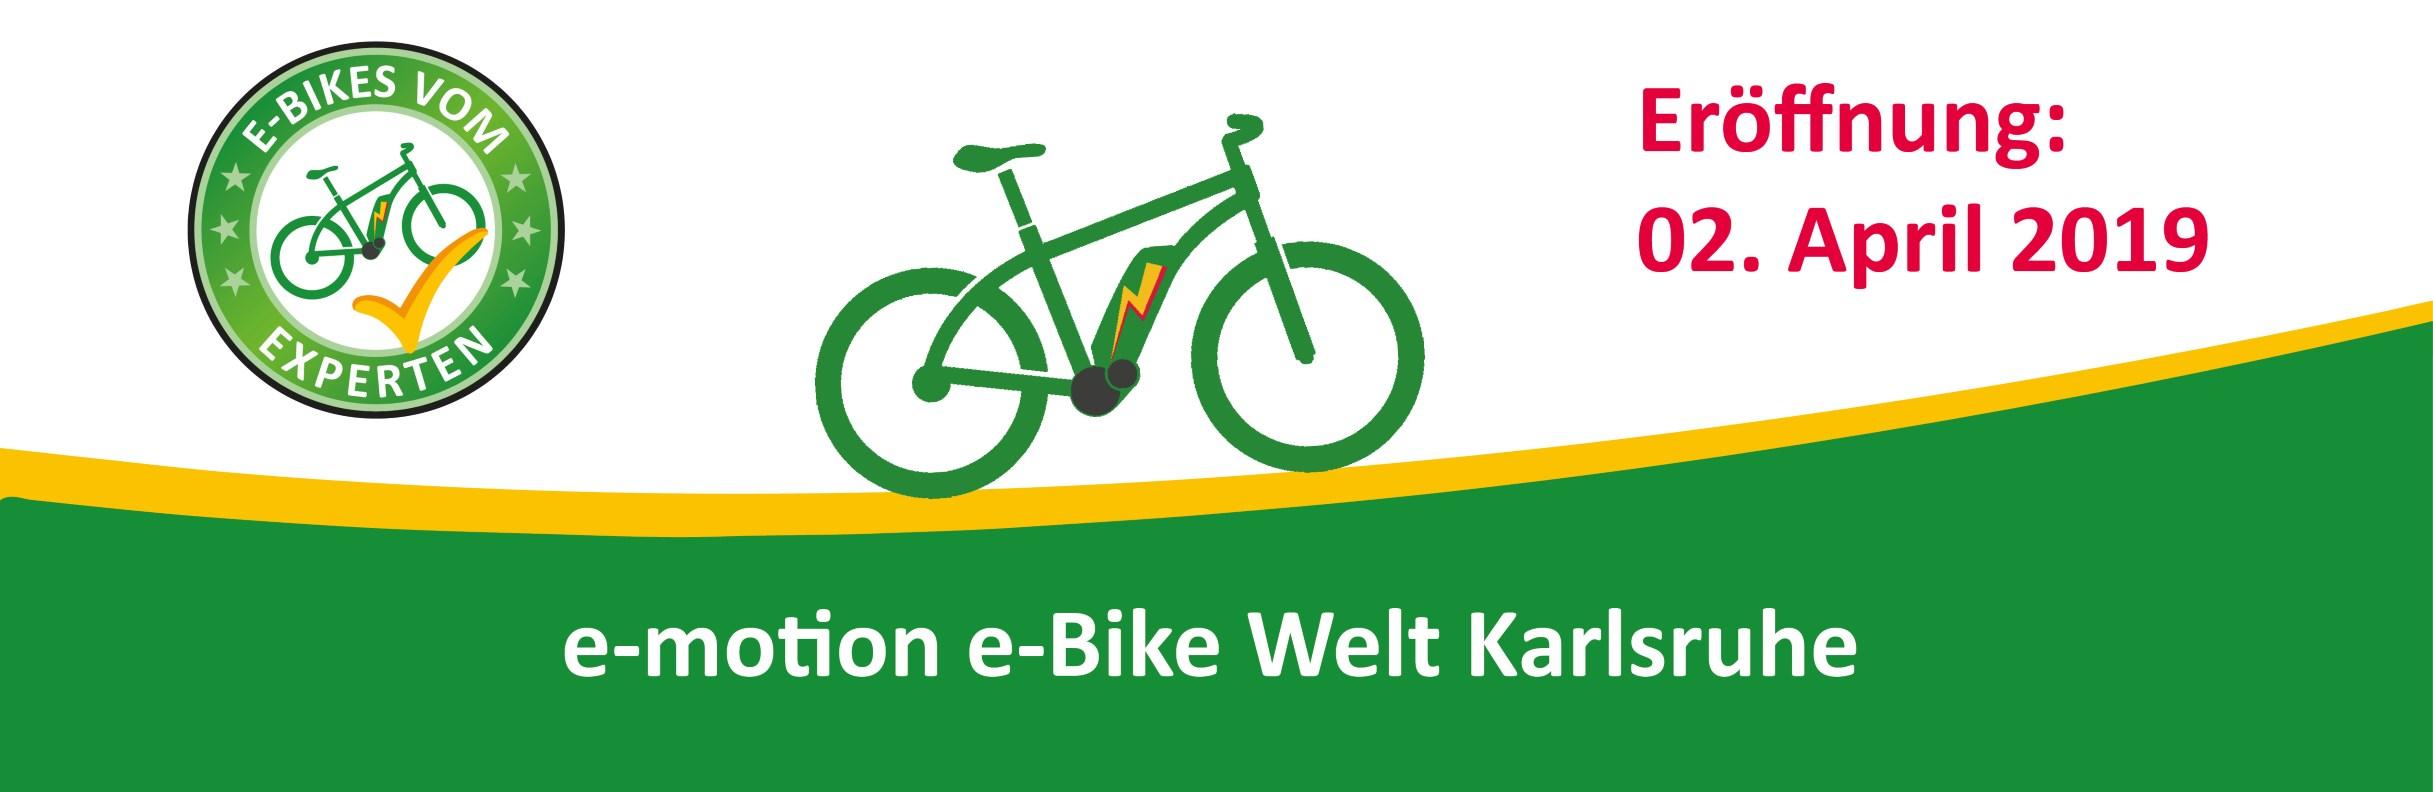 e-motion e-Bike Welt Karlsruhe